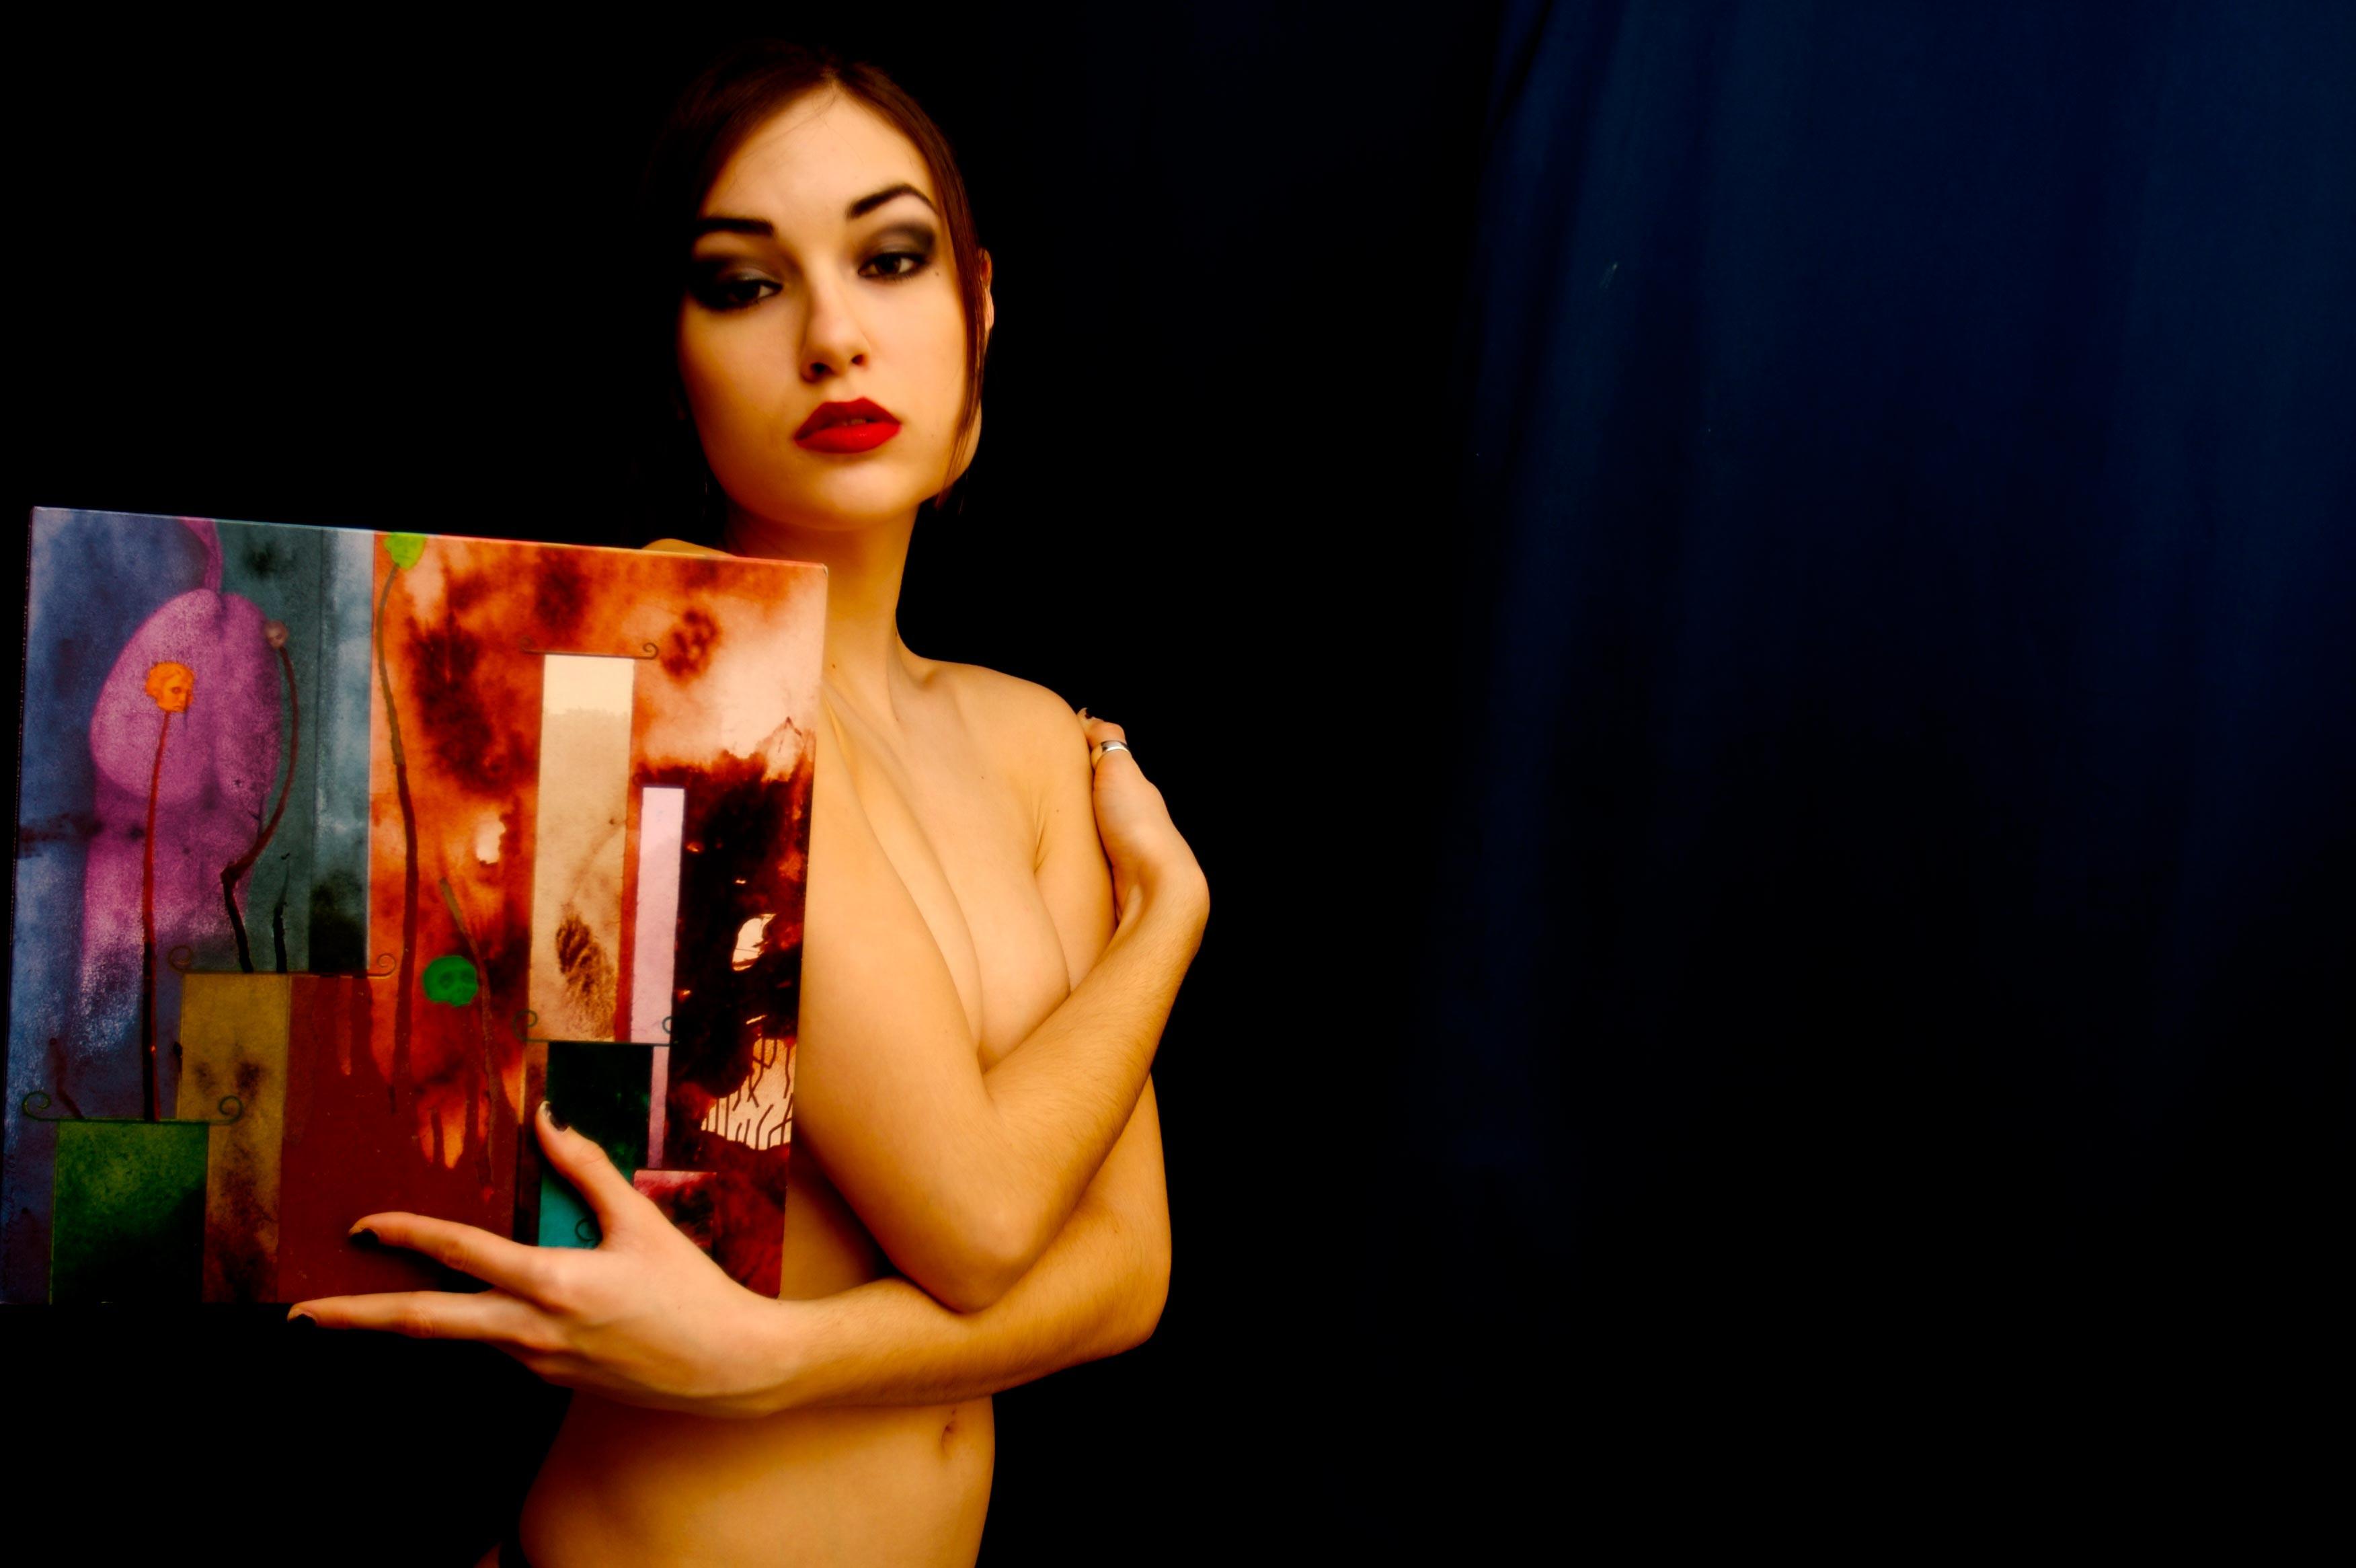 Саша грей актриса 22 фотография